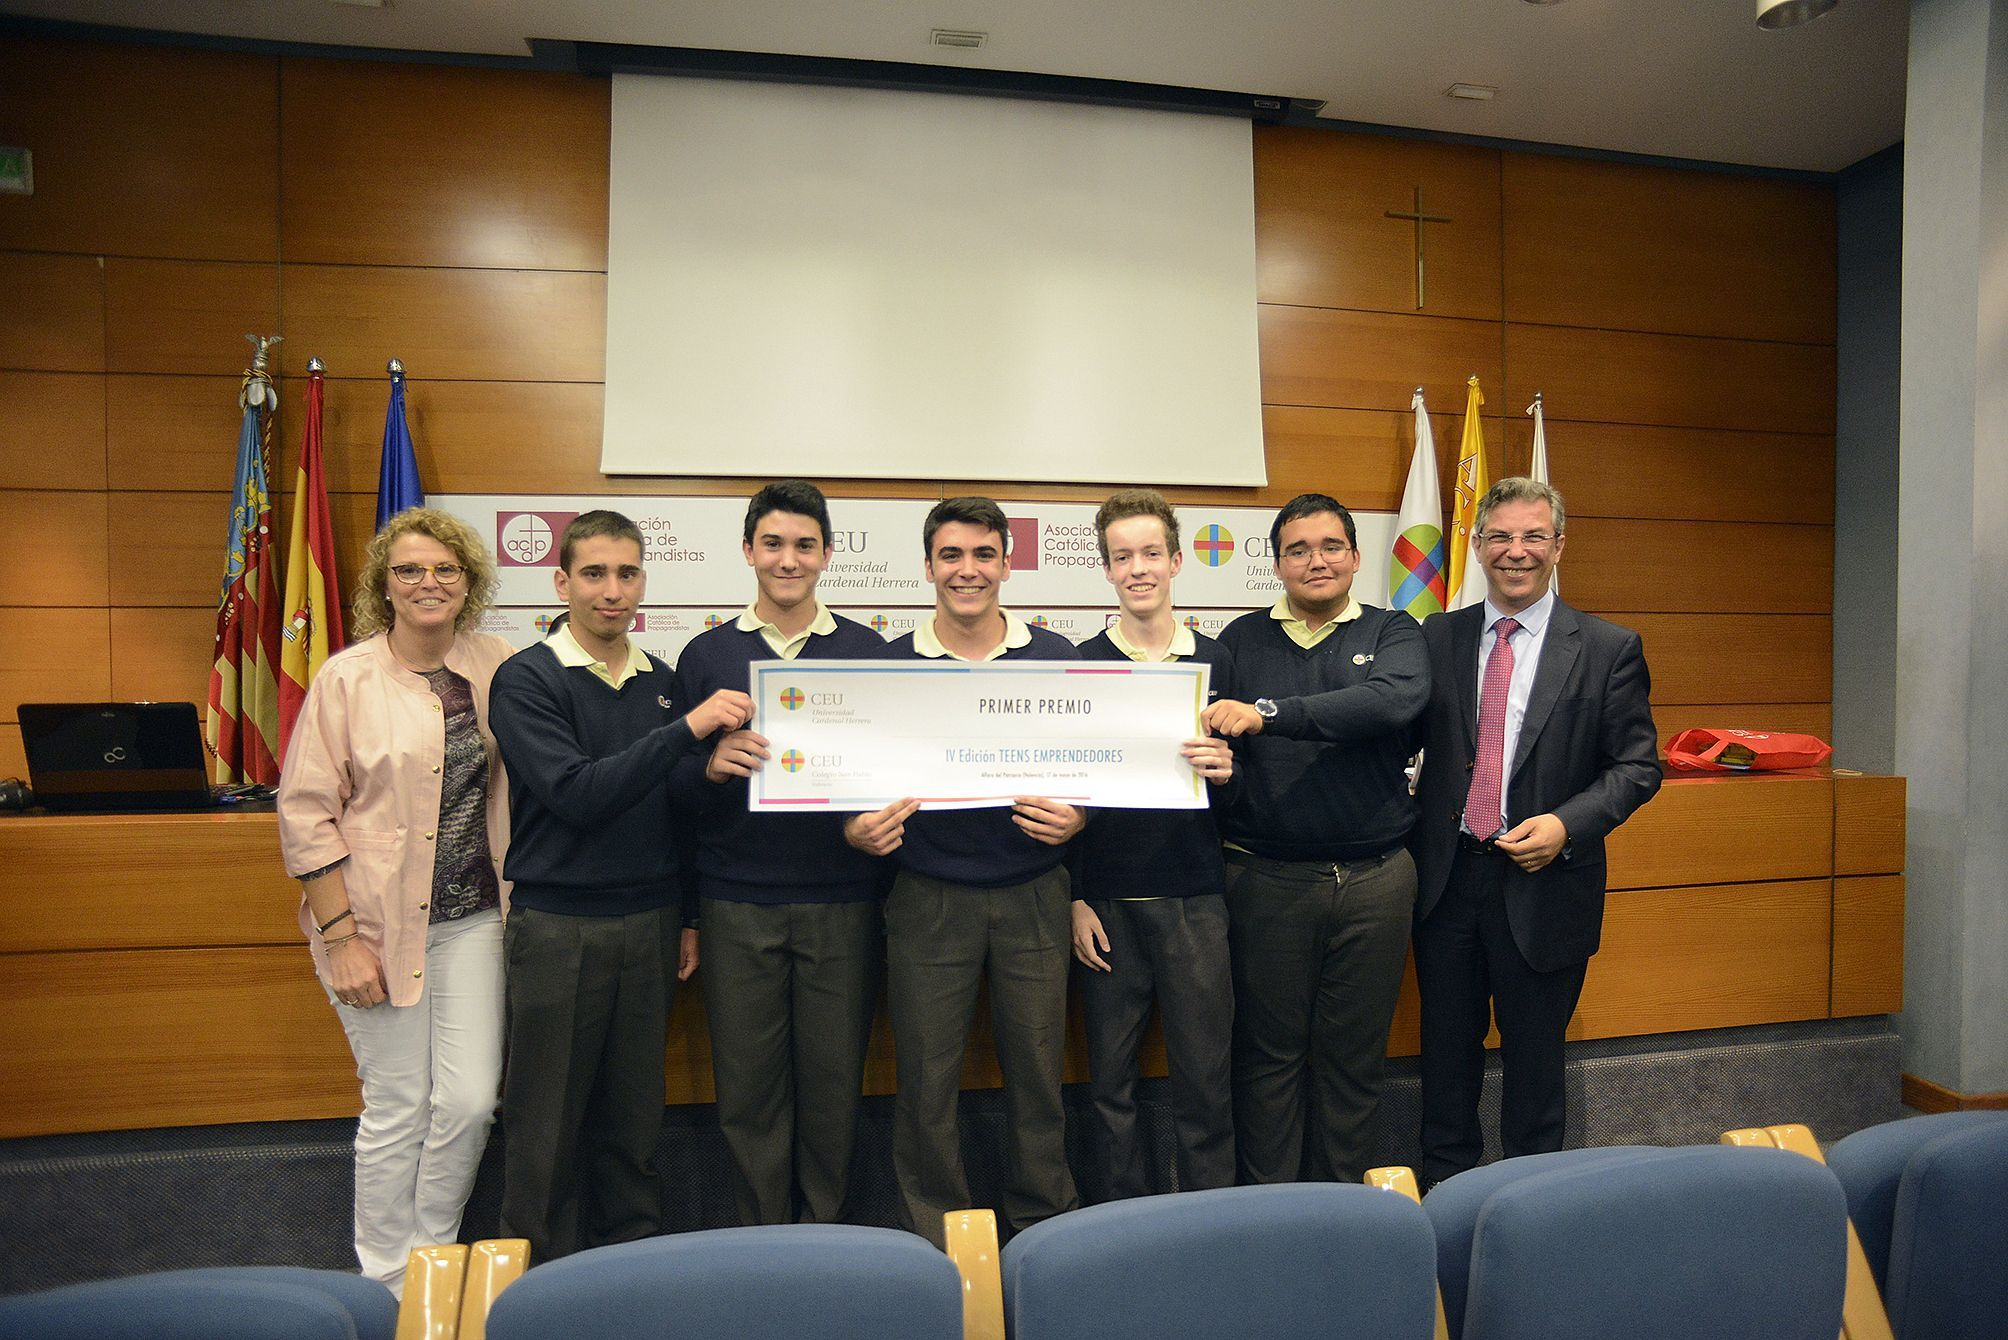 ganadores-iv-edicion-teens-emprendedores